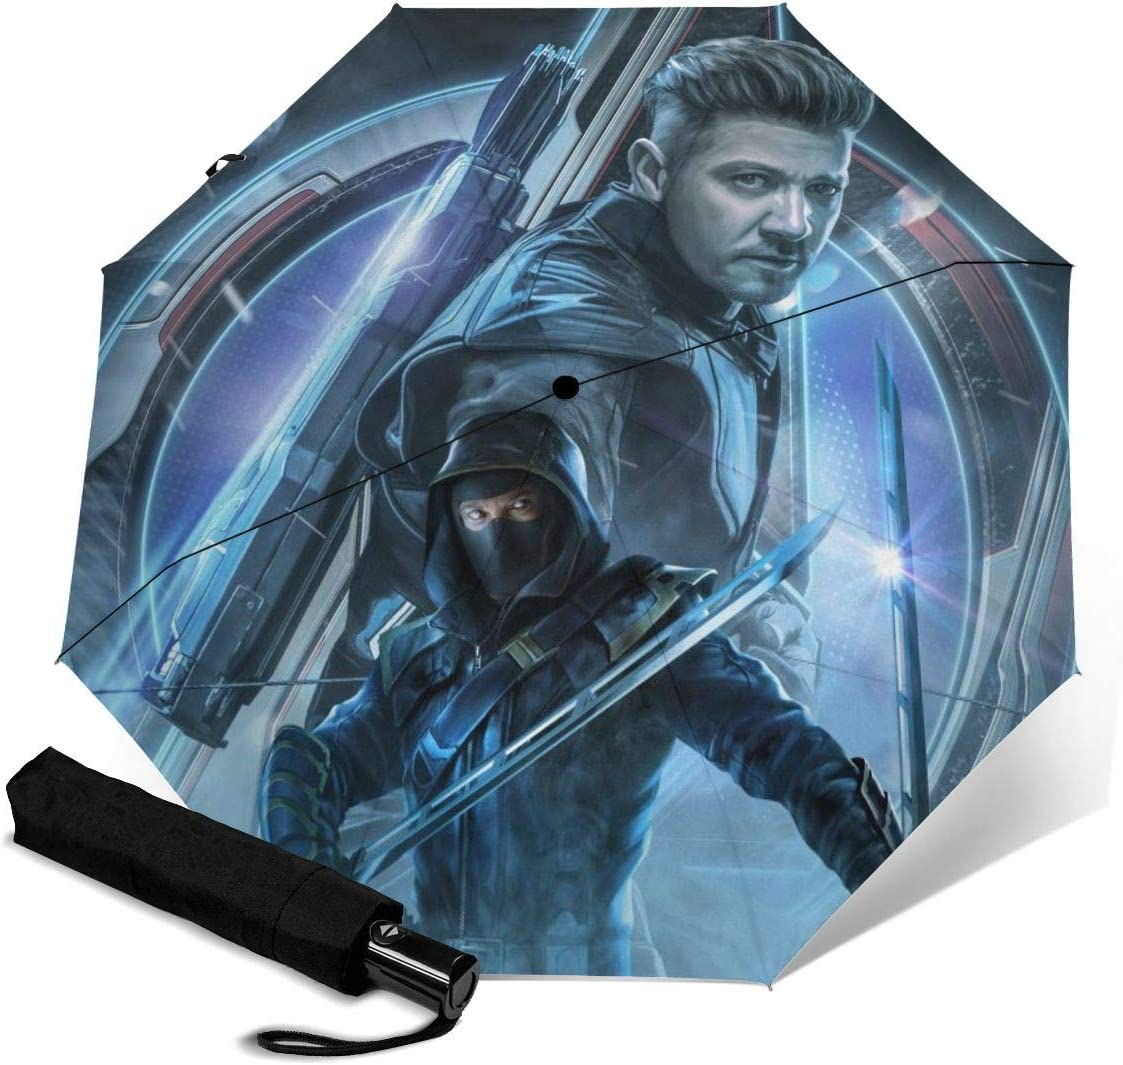 The Avengers Endgame Compact Auto Open Close Folding Business Umbrellas UV Protection Automatic Tri-fold Umbrella for Men and Women Lovesofun Portable Automatic Umbrella